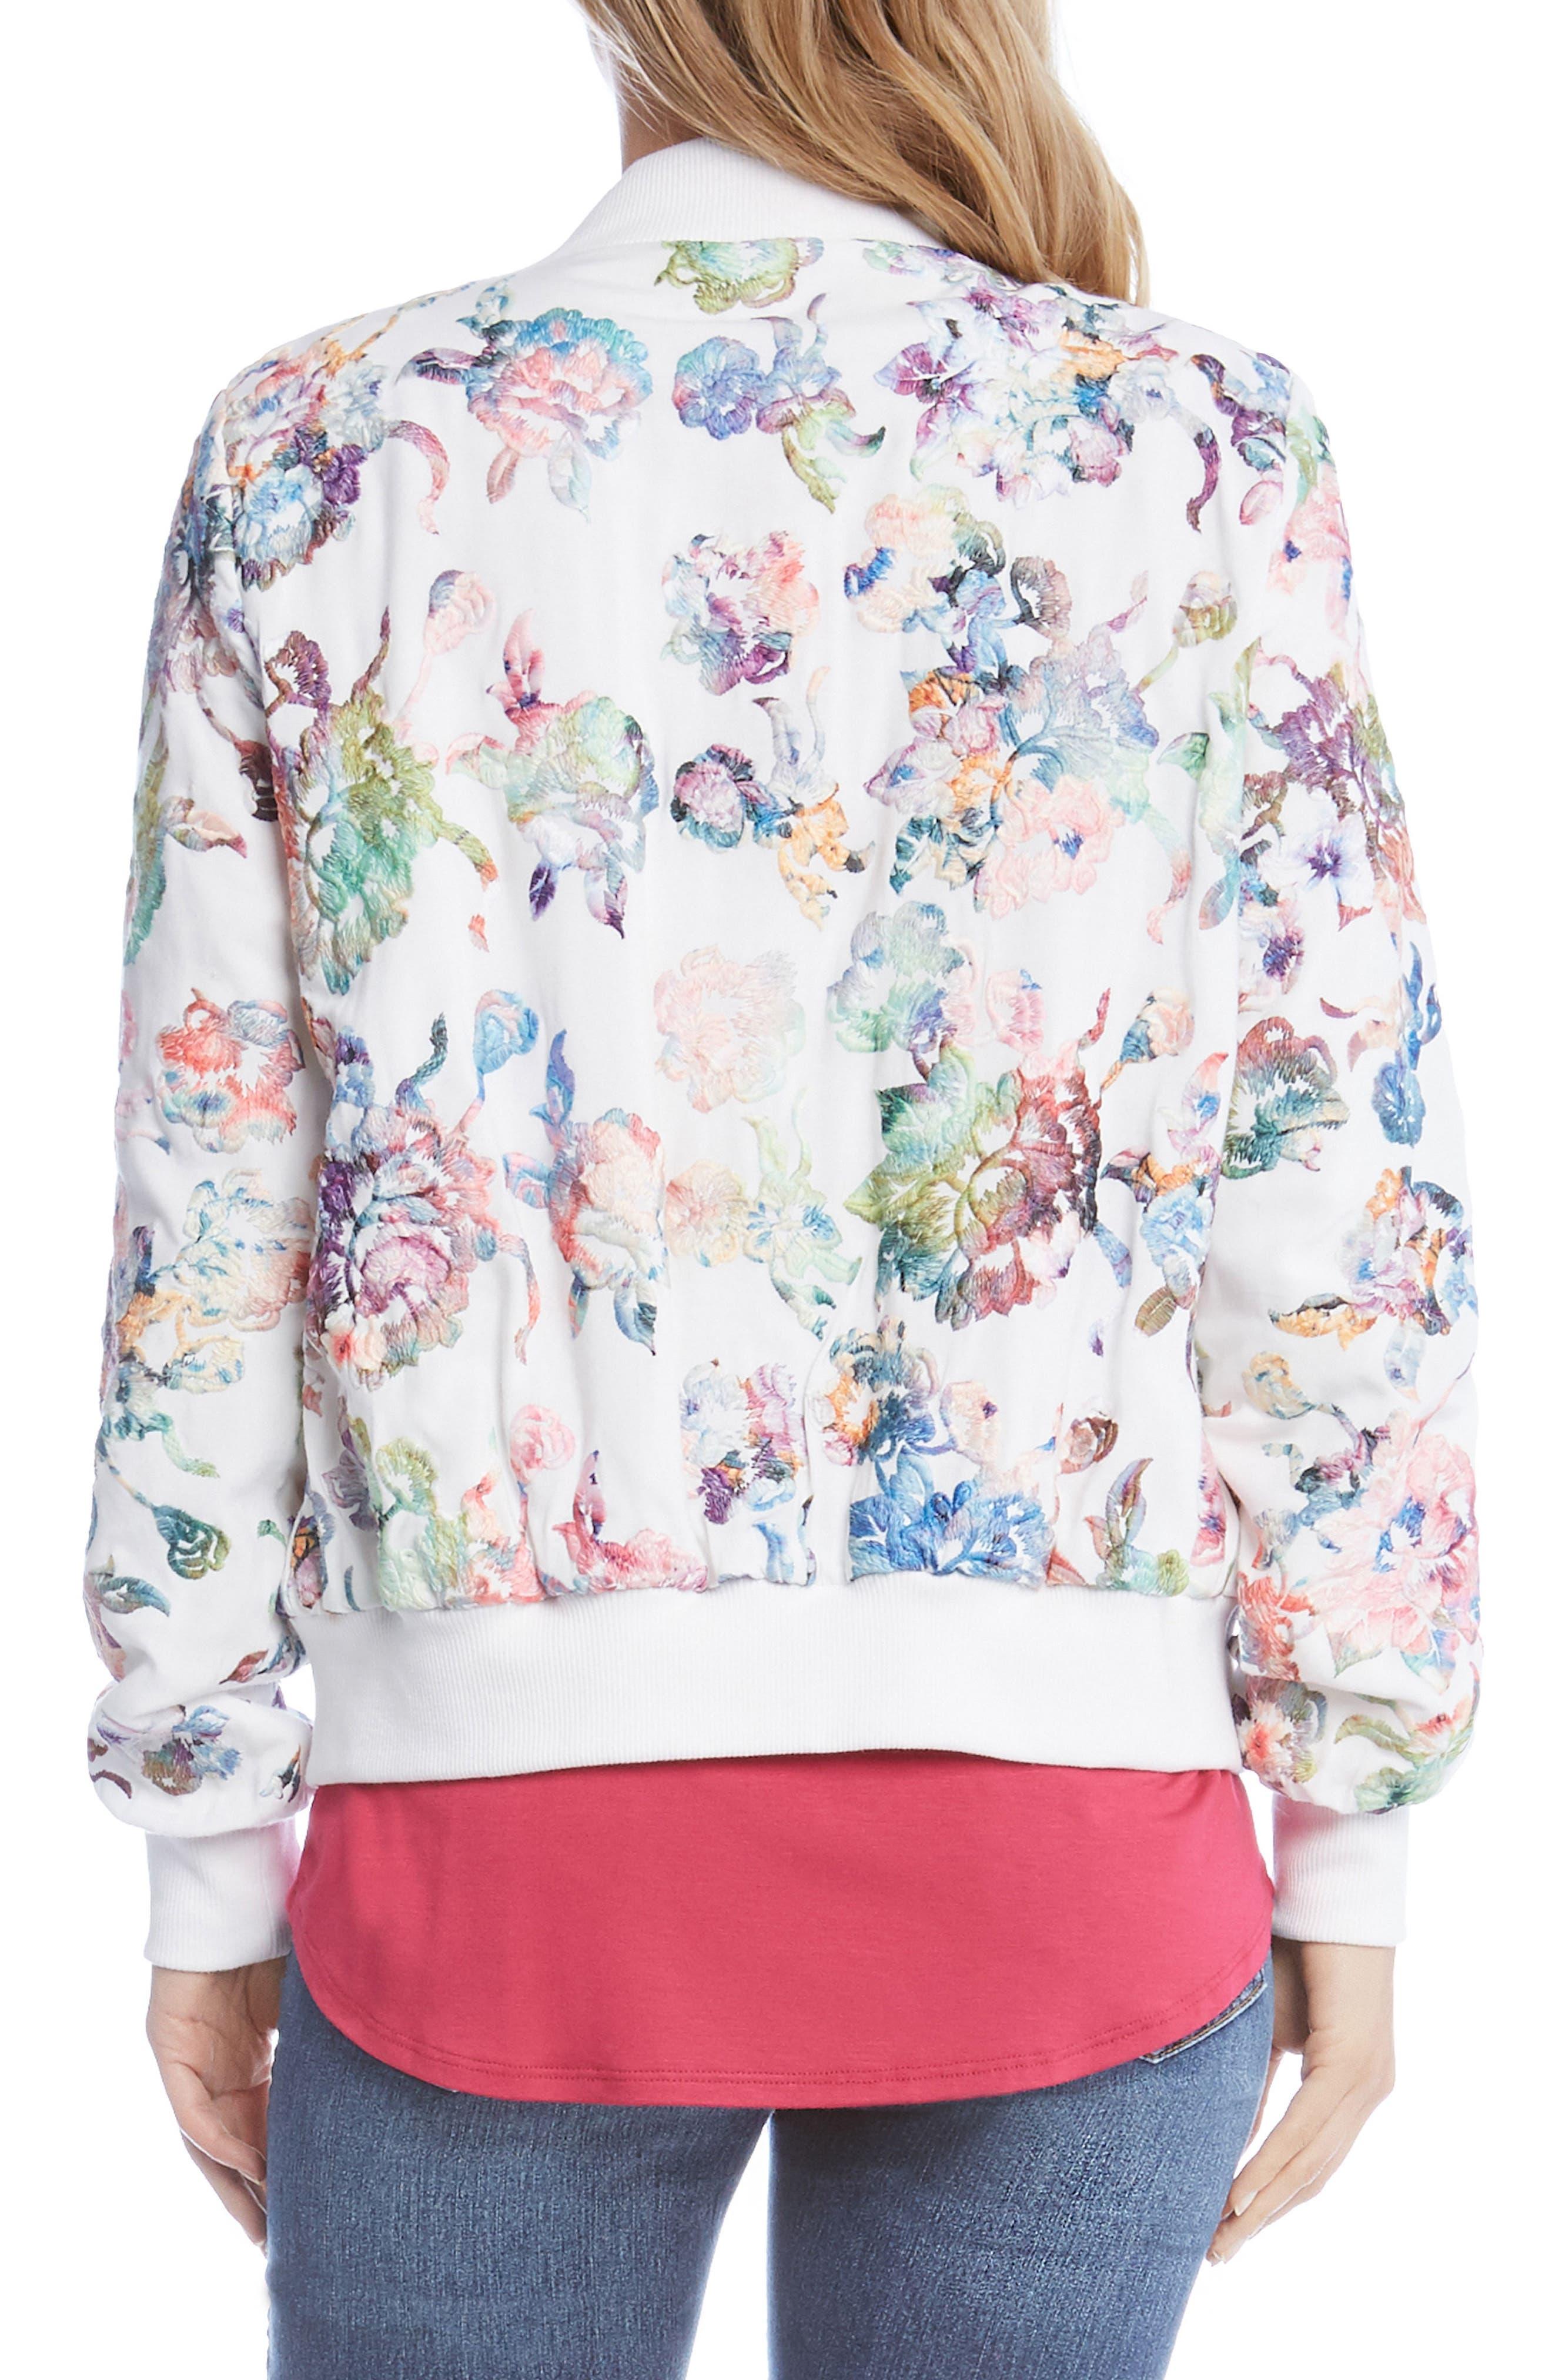 Embroidered Floral Bomber Jacket,                             Alternate thumbnail 2, color,                             188